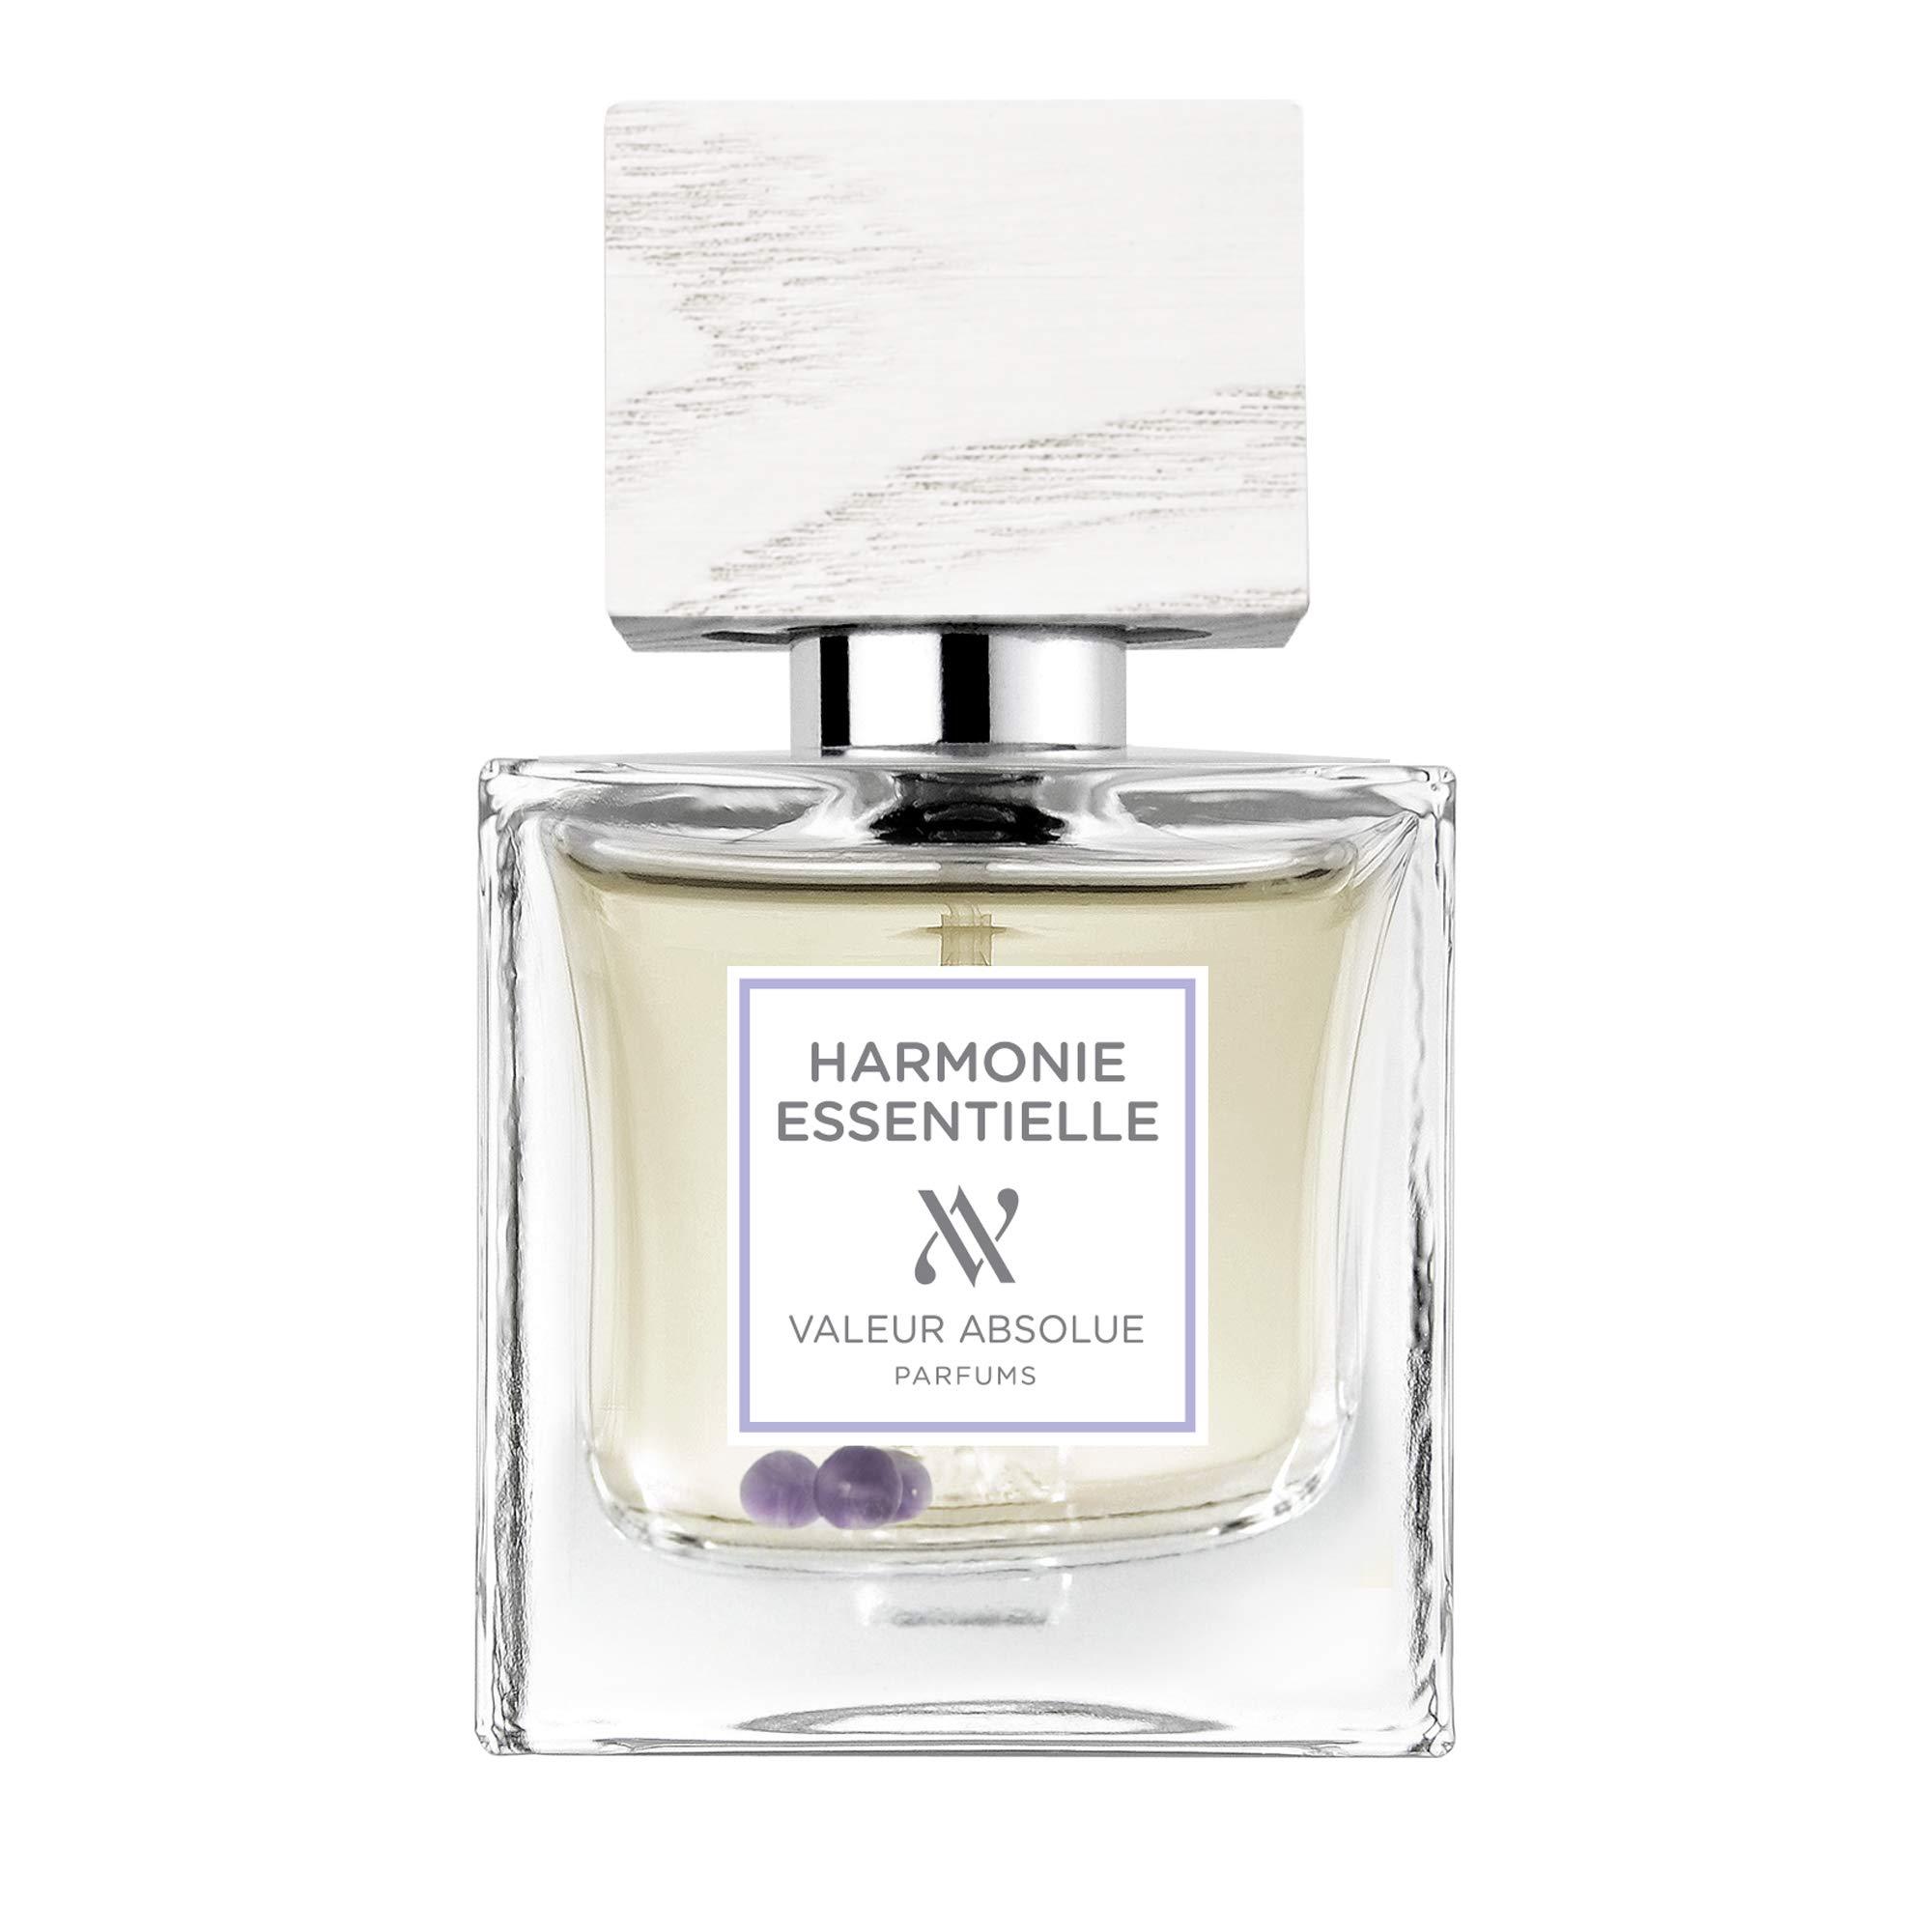 Valeur Absolue Organic Harmonie Essentielle Perfume   Encourages Mindfulness   Citrusy & Woody   Certified Organic Fragrance   1.7 Fluid Ounces